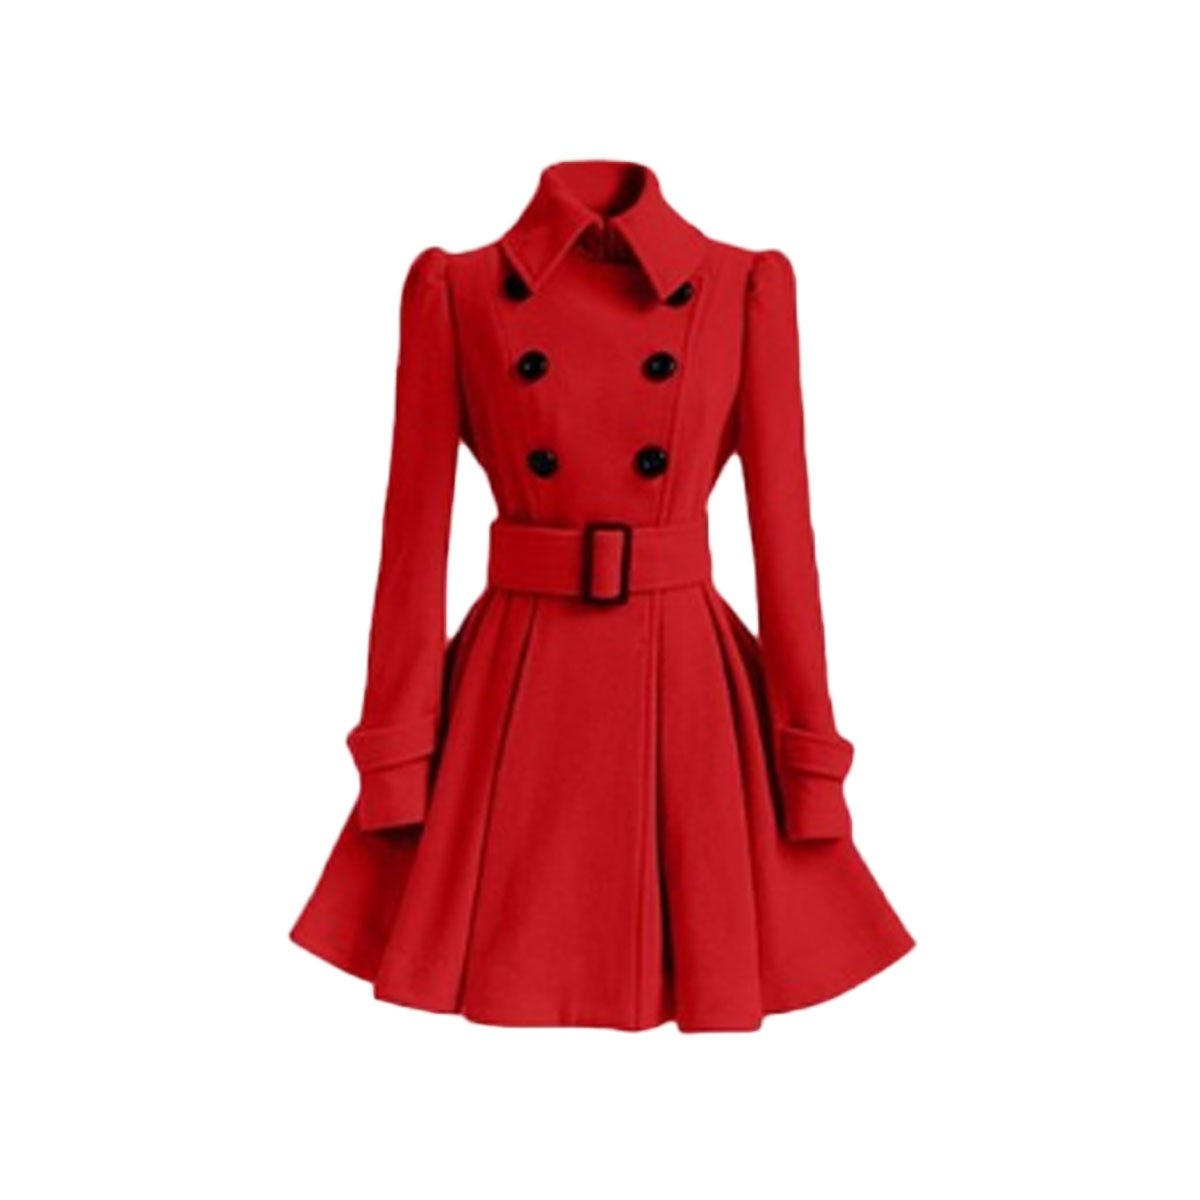 LANMWORN Women's Lapel Woolen Double-Breasted Pea Coat Trench Jacket With Belt, Big Swing Dress Style Buckle Coat